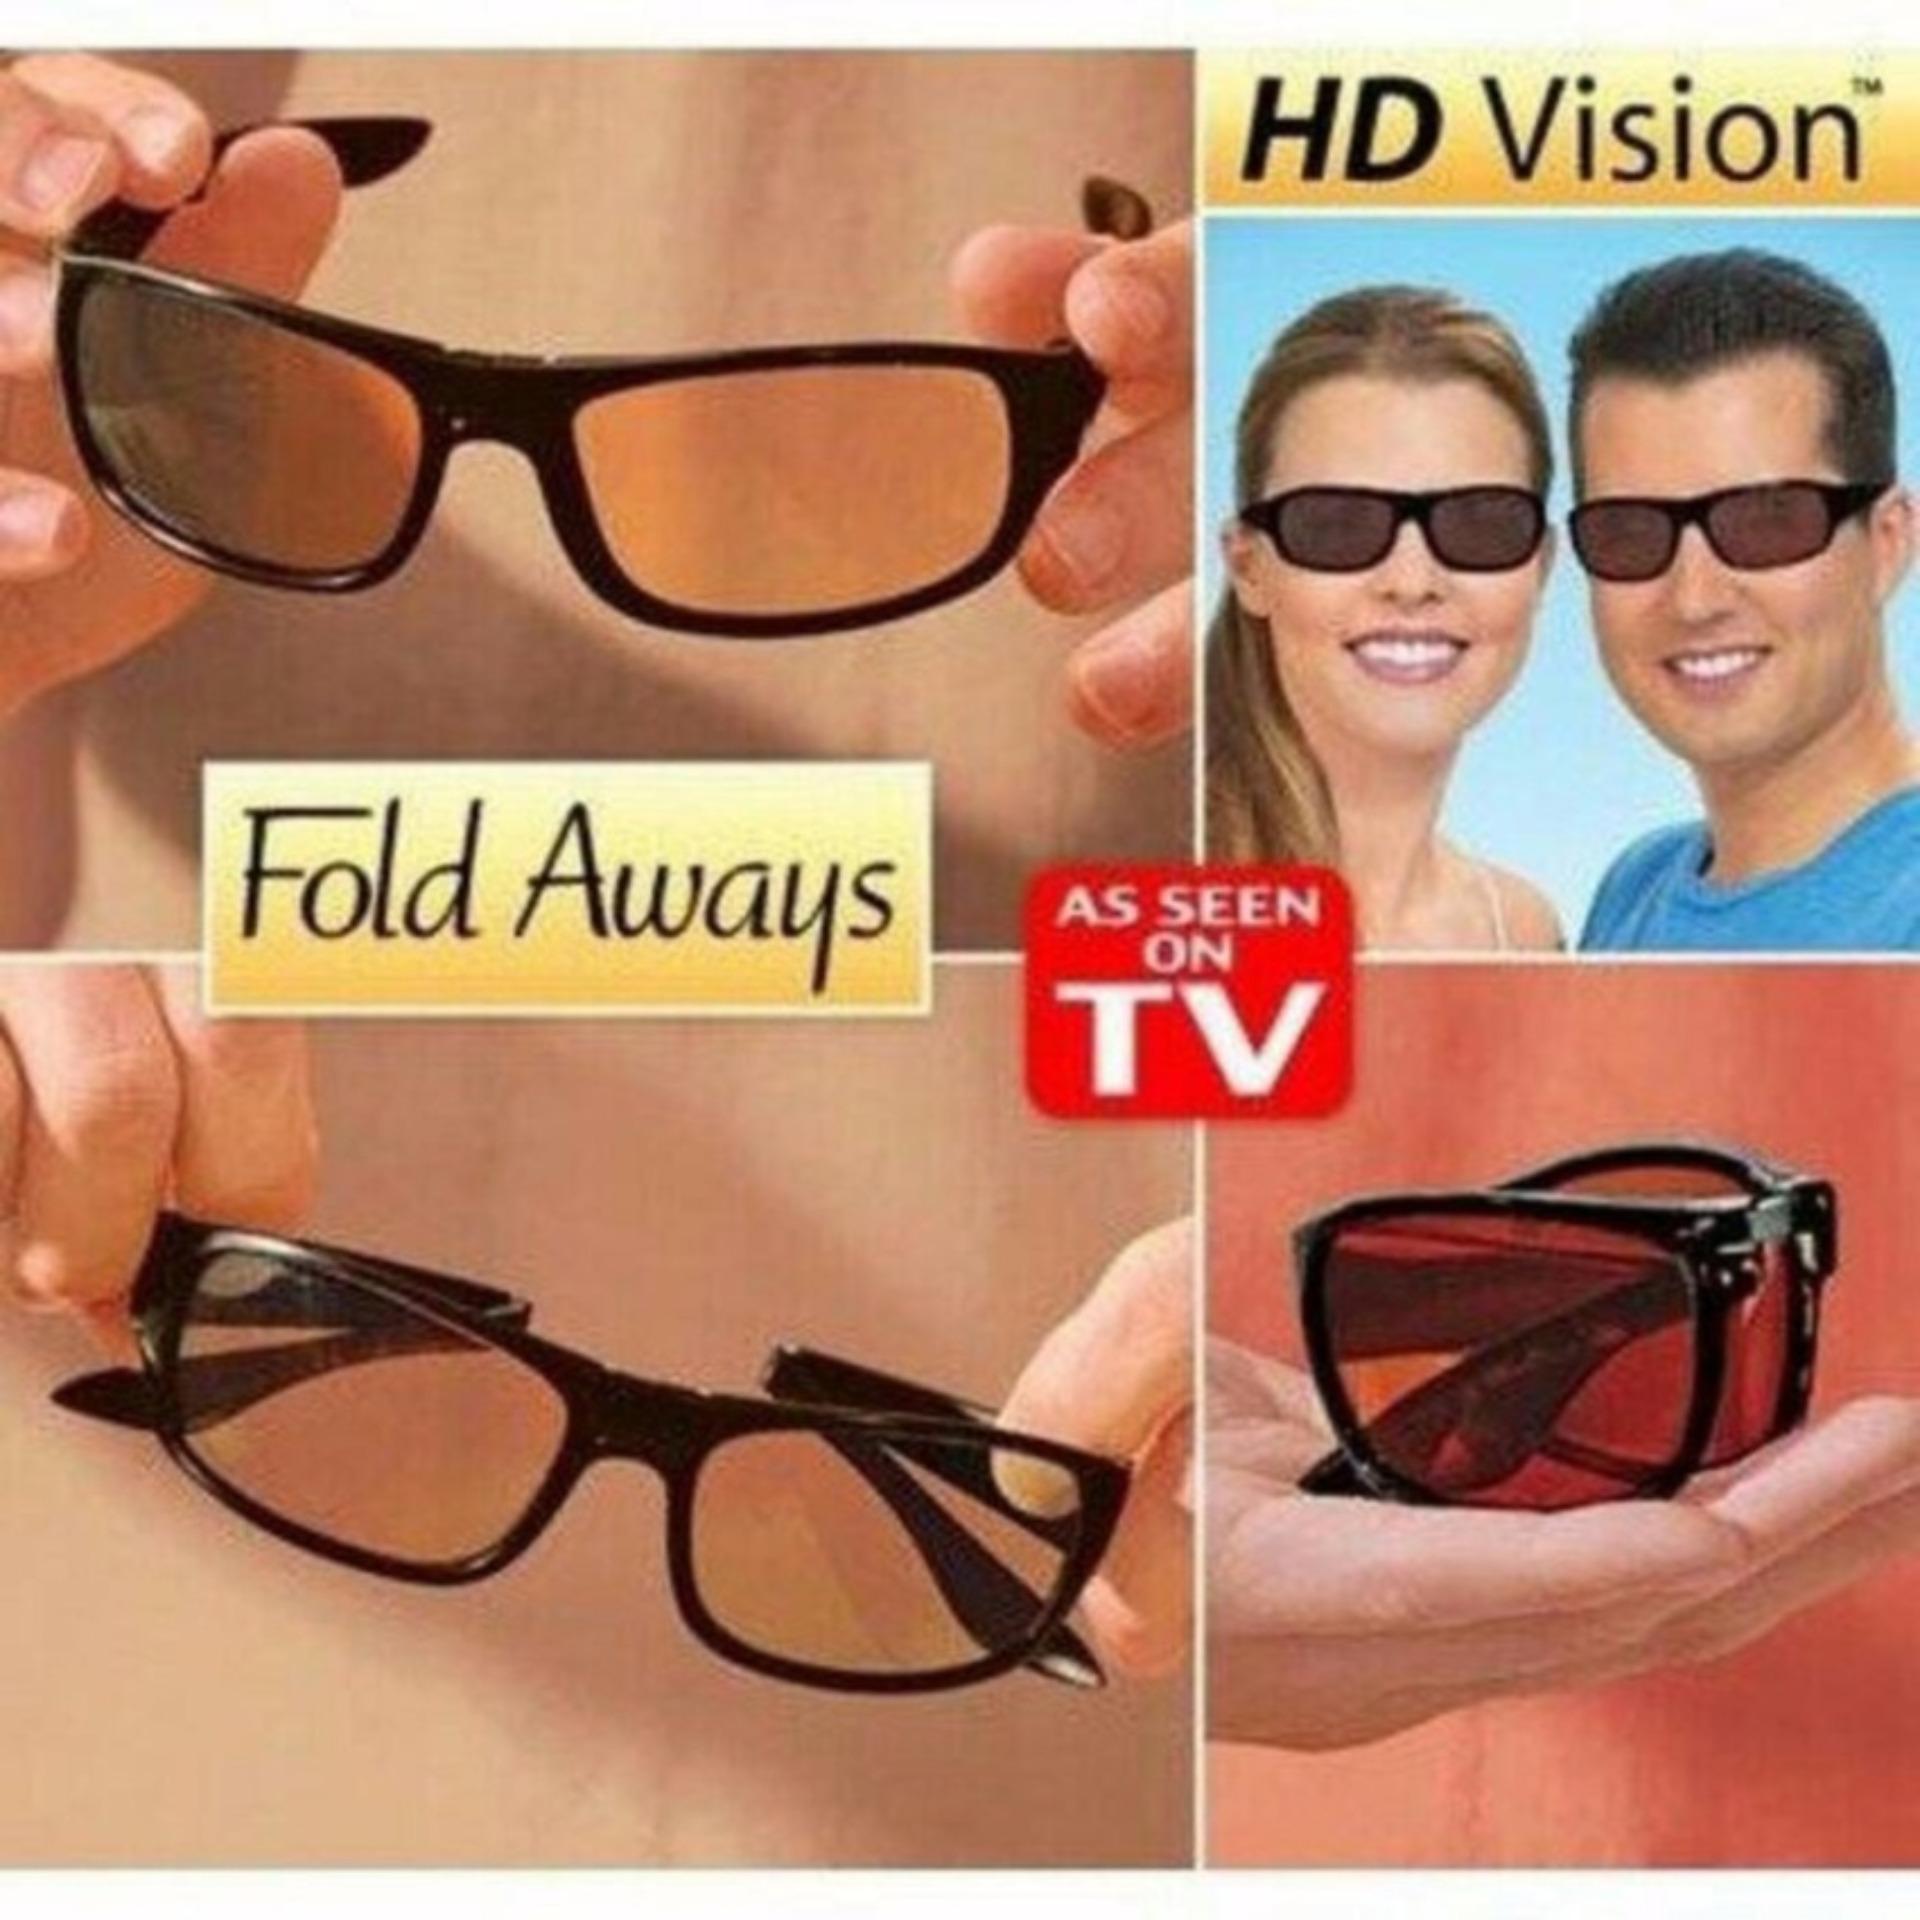 Kacamata Anti Silau Lipat Hd Vision Fold Always Free Sarung Cek Malam Kuning Night View Glasses Sj0038 Sunglasses Aways